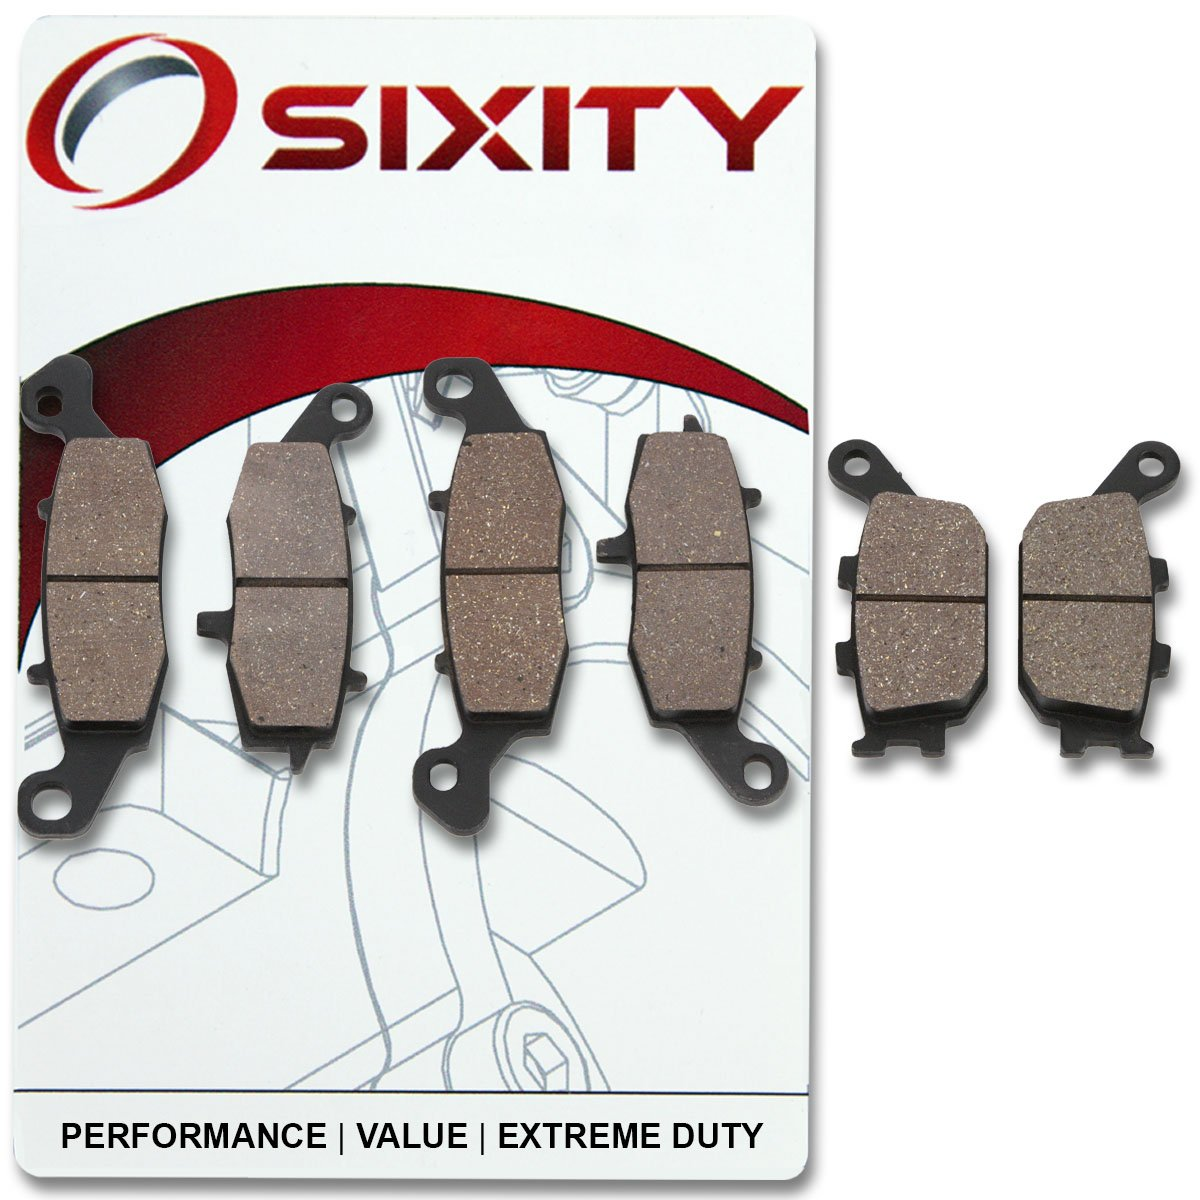 Rear Organic Brake Pads 2003-2008 Suzuki SV650 Set Full Kit K3 K4 K5 K6 K7 K8 K9 Complete Sixity Front